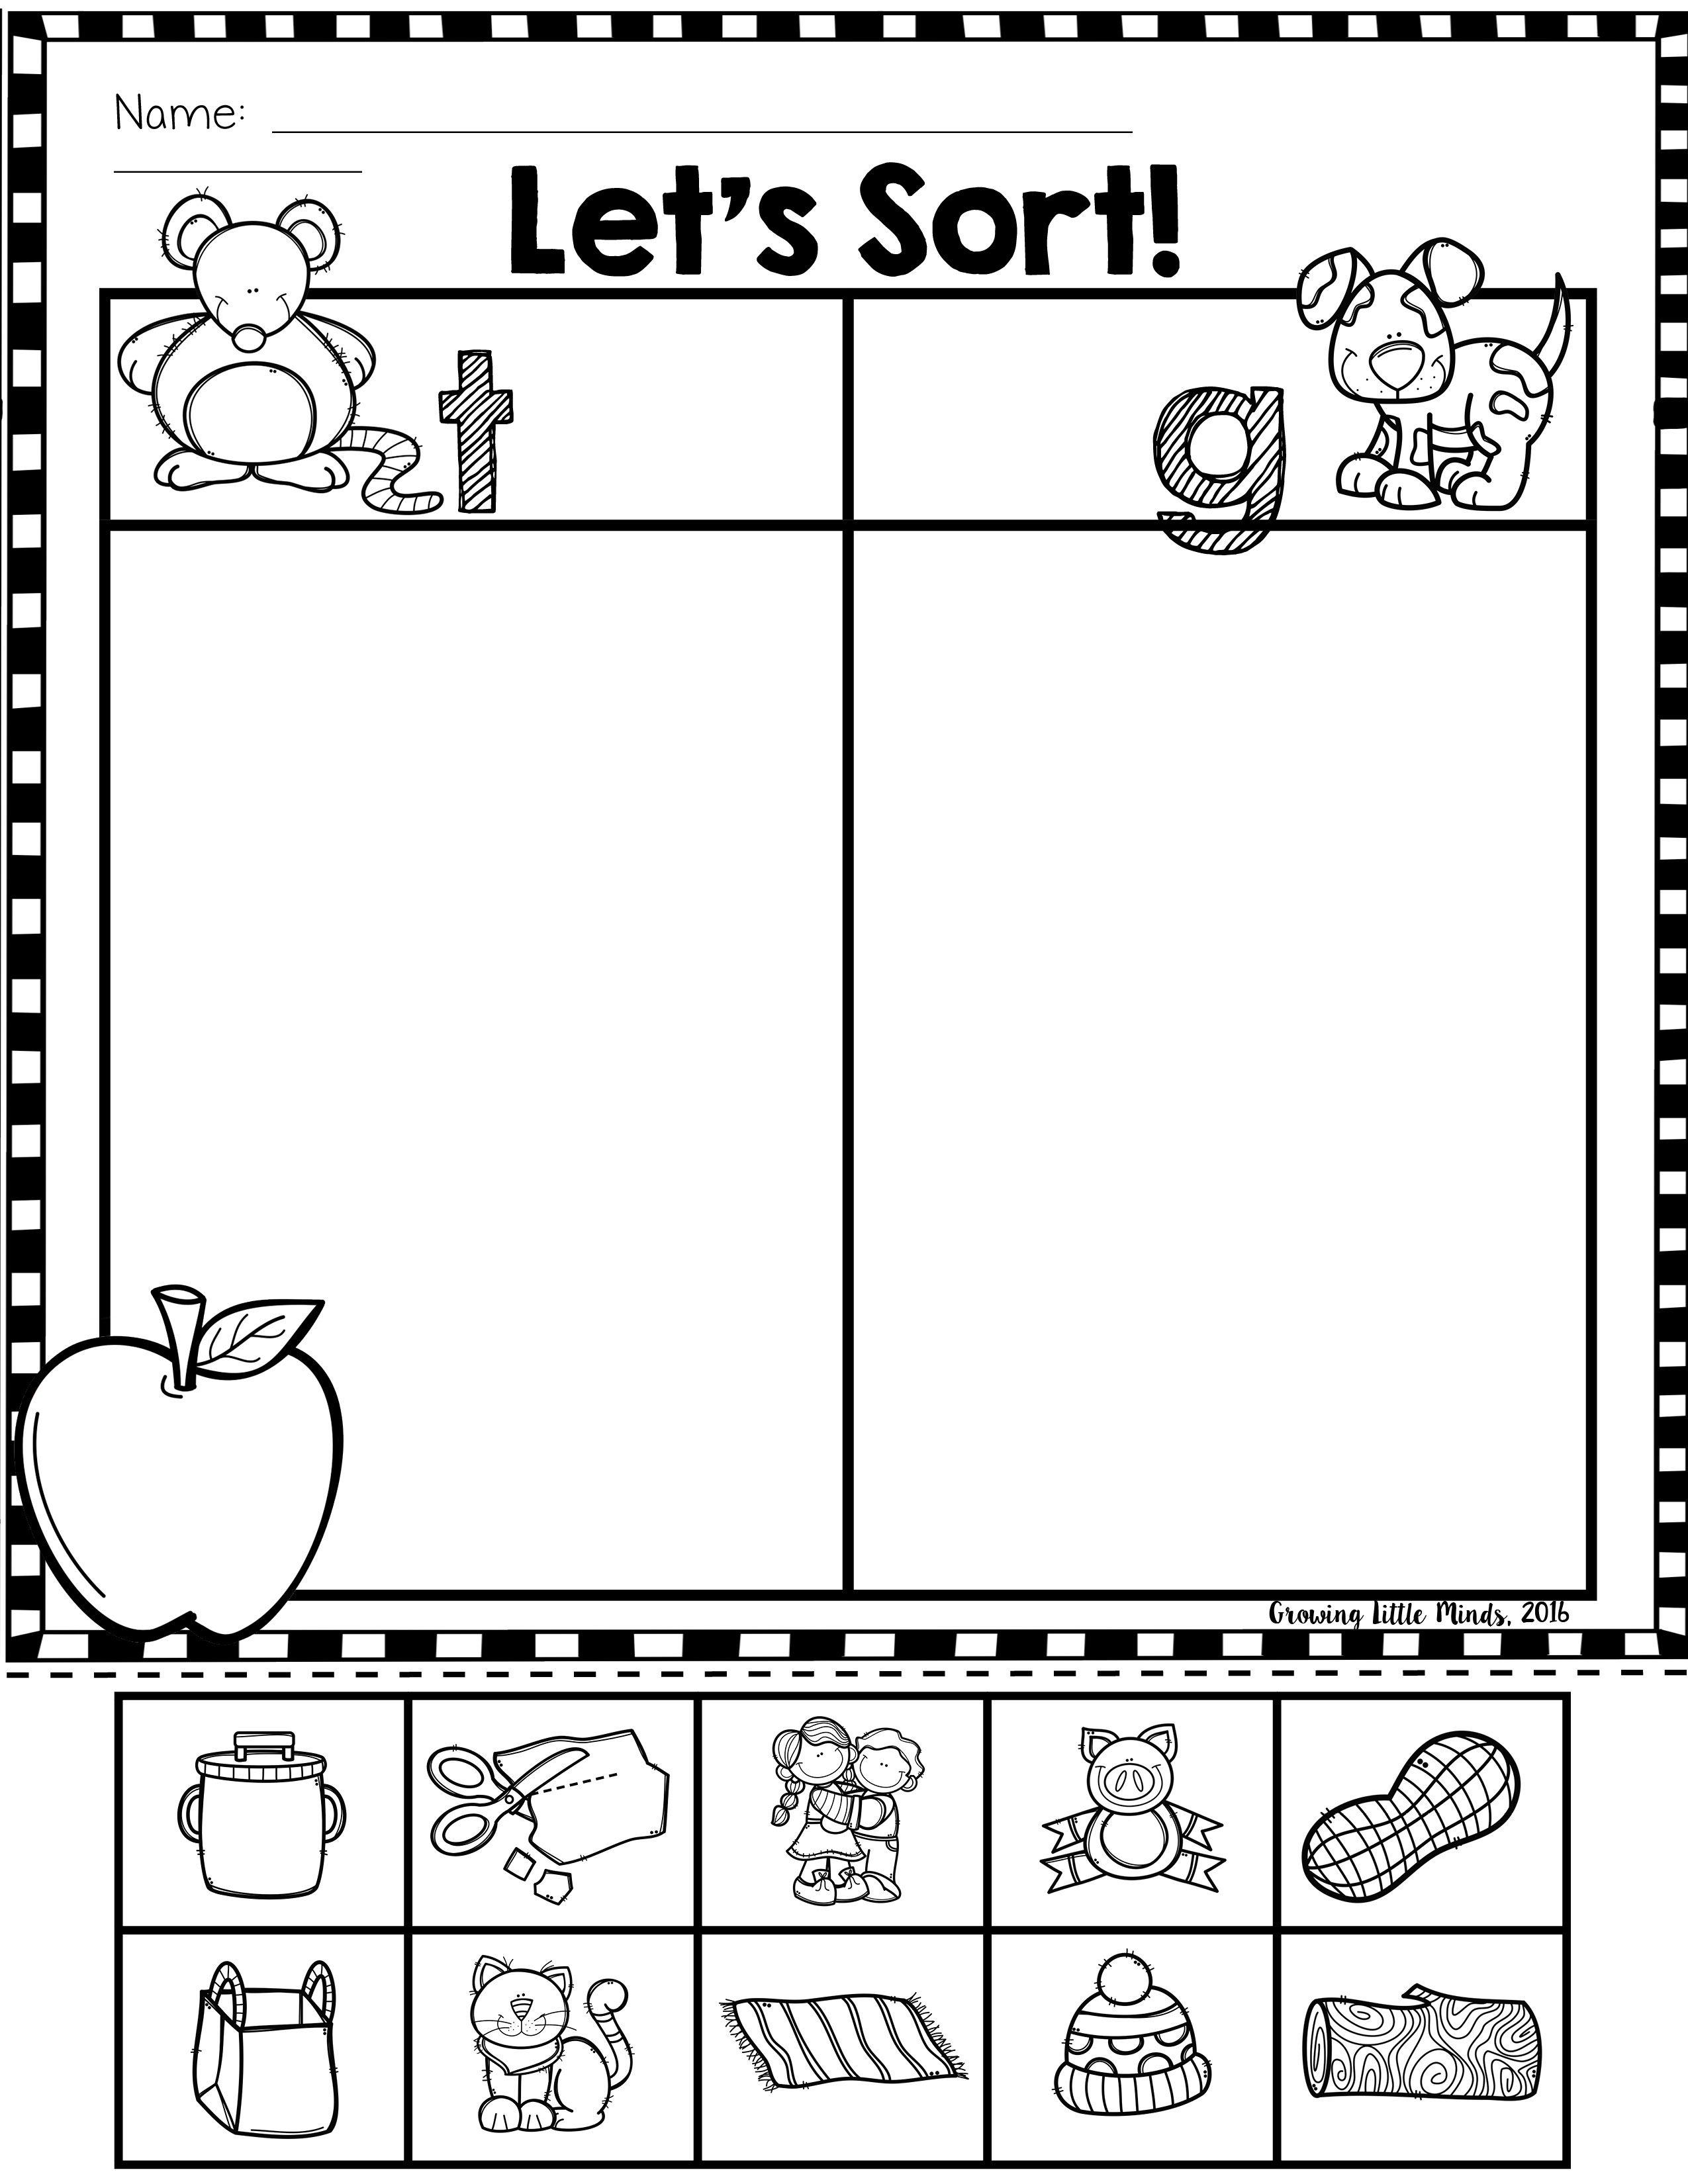 Ending Sounds Phoneme Isolation Sorts Kindergarten Worksheets Kindergarten Worksheets Printable Free Kindergarten Worksheets [ 3300 x 2550 Pixel ]